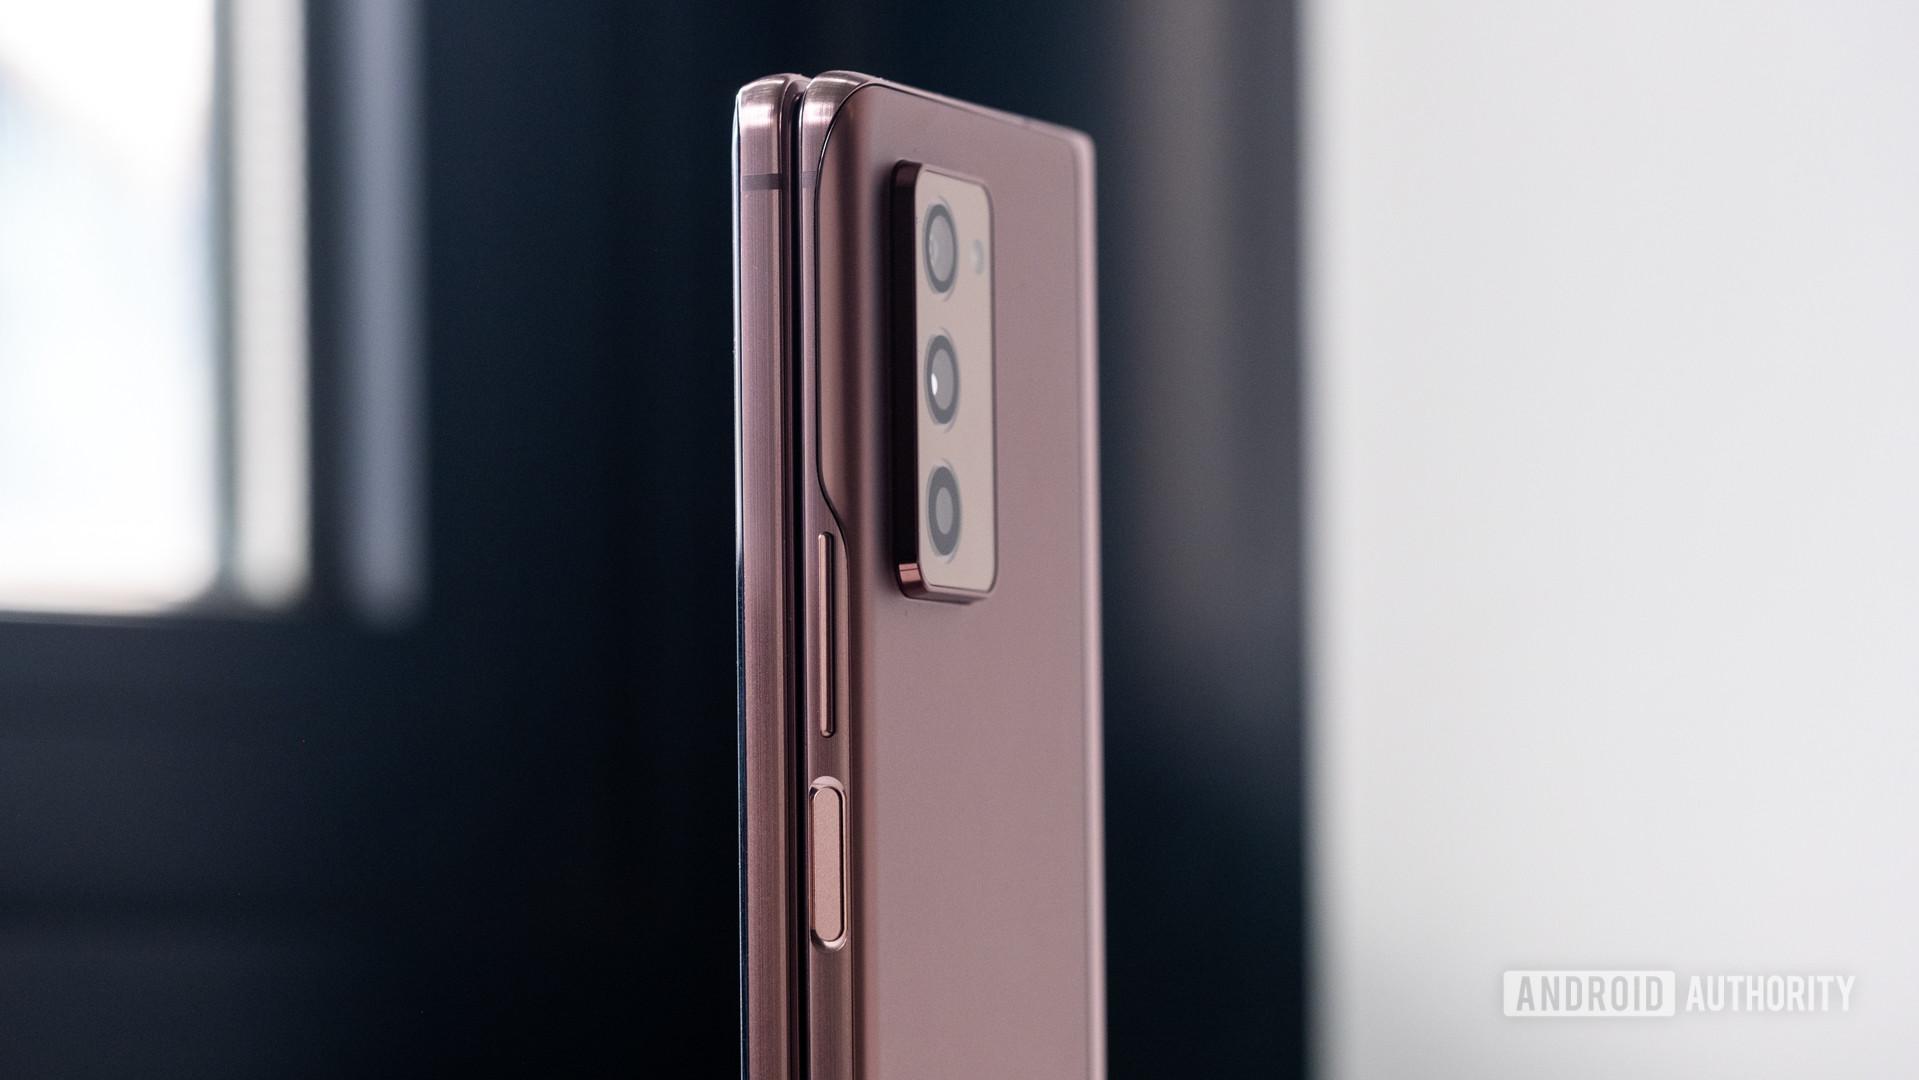 Samsung Galaxy Z Fold power and volume rockers